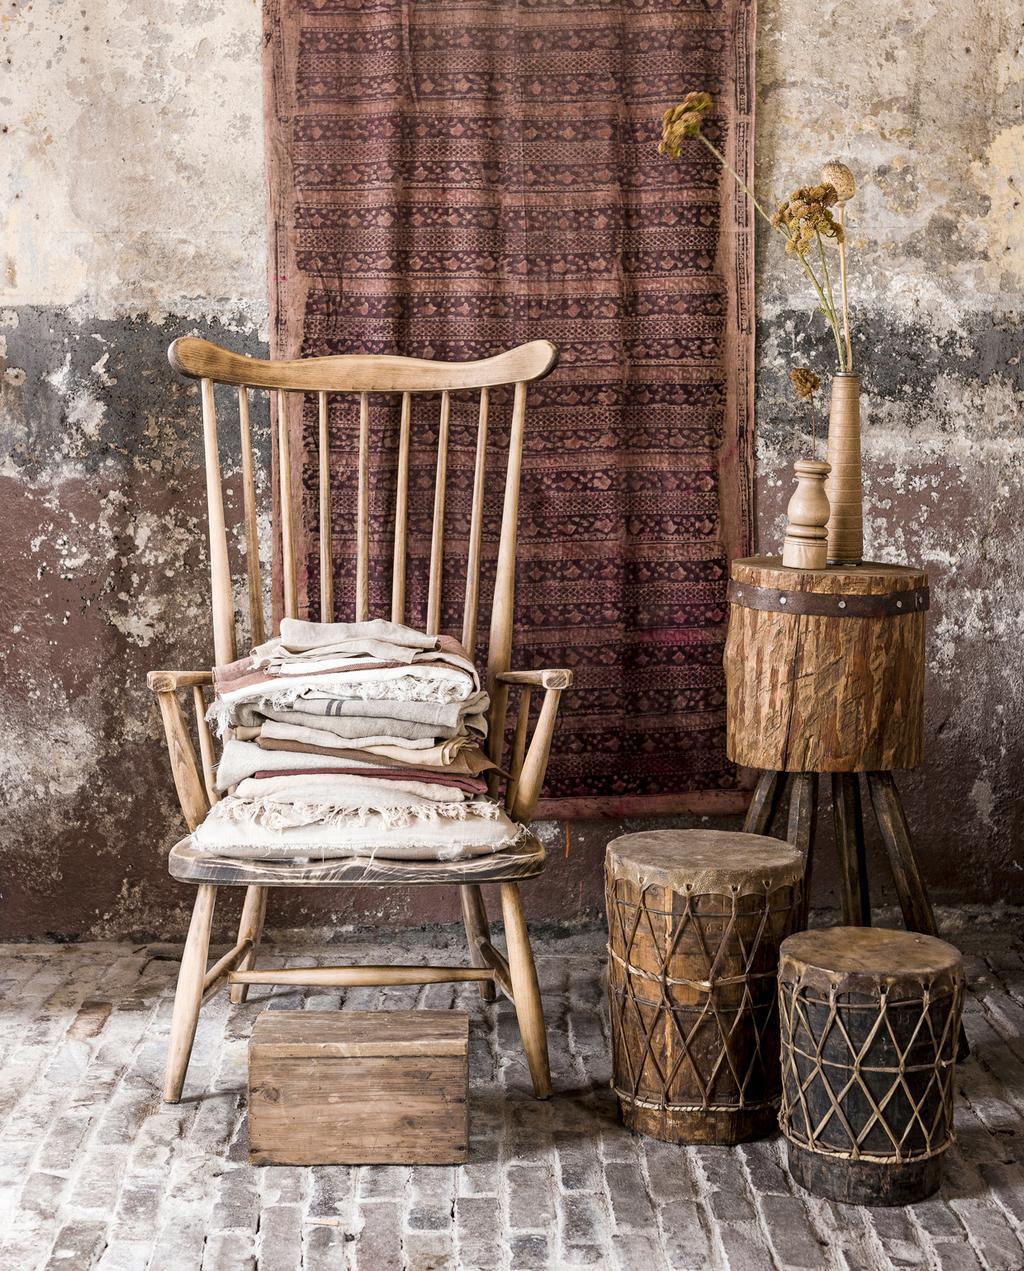 vtwonen   klein budget   houten stoel